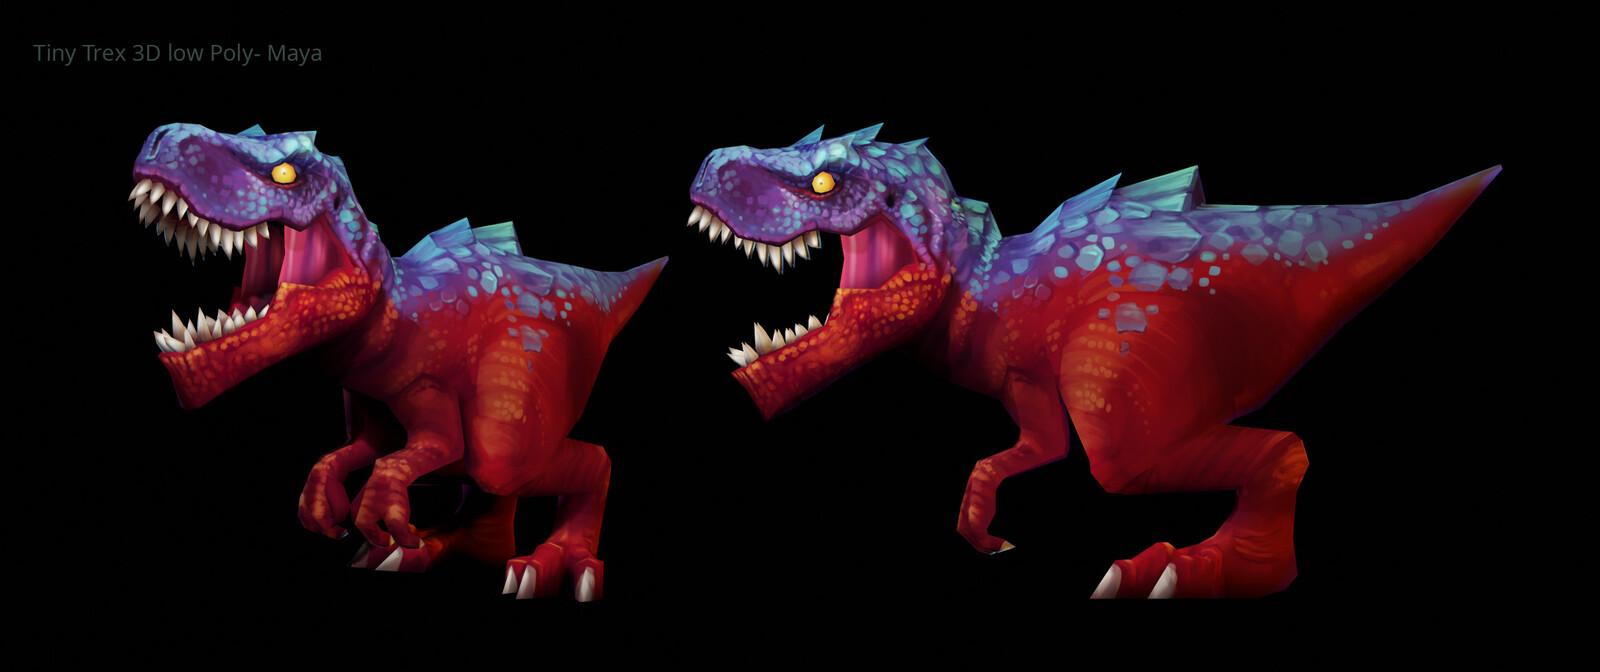 Quick 3D render - Maya and Blender (Eeve)